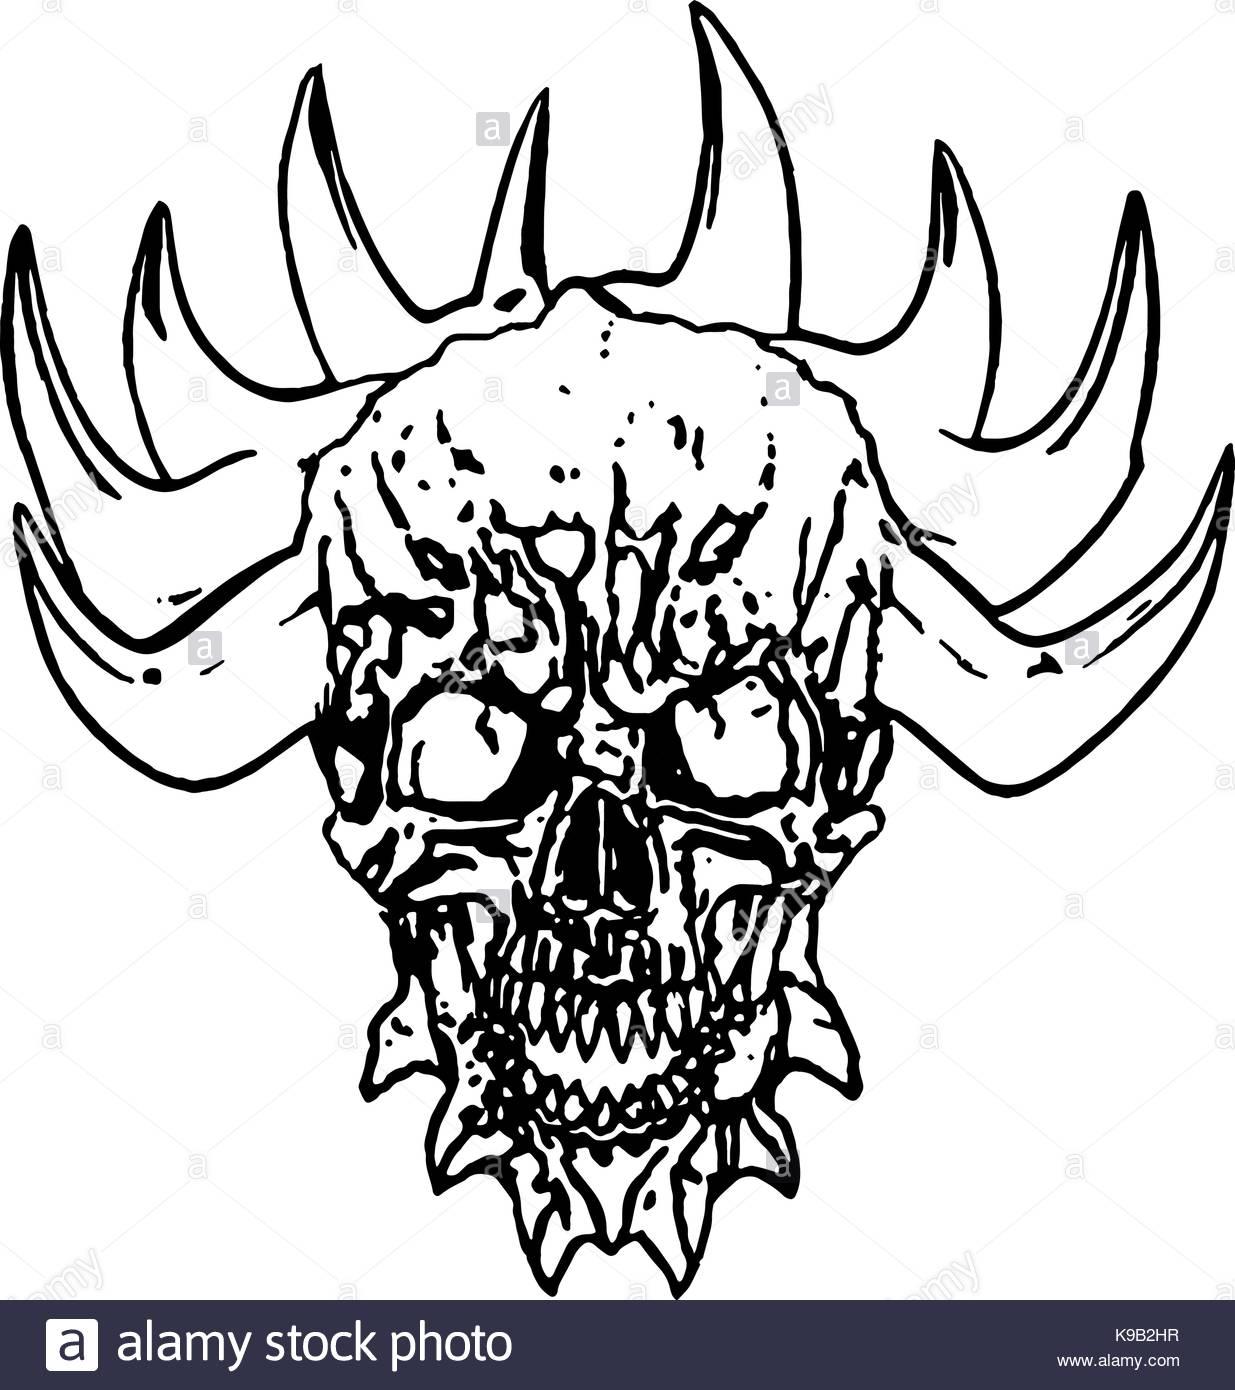 1235x1390 Demon Horns Stock Photos Amp Demon Horns Stock Images